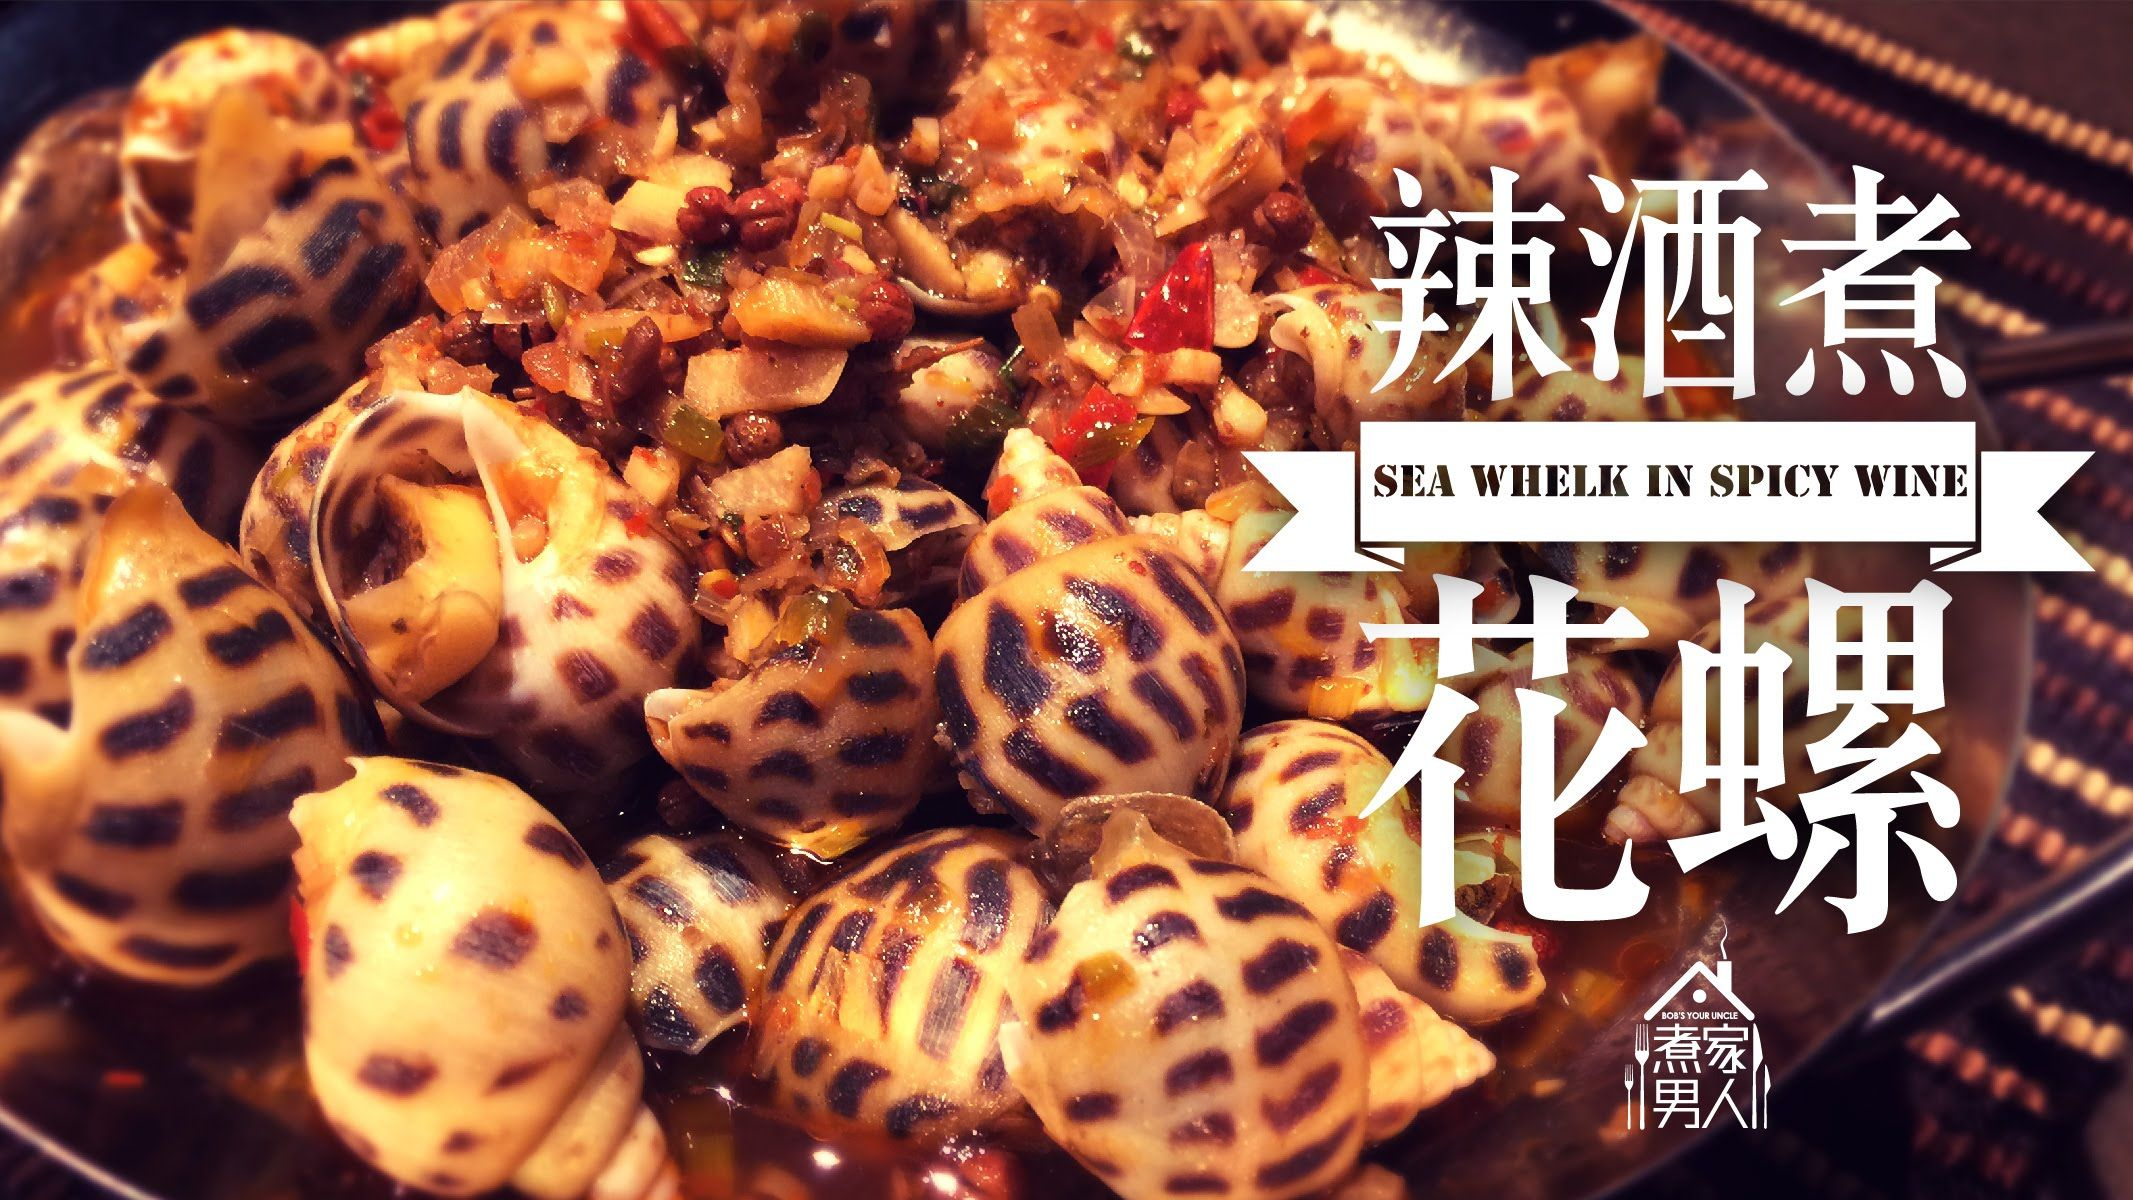 辣酒煮花螺 Sea Snails in Spicy Wine | escargots recipes | Wine search, Sea snail, Spicy